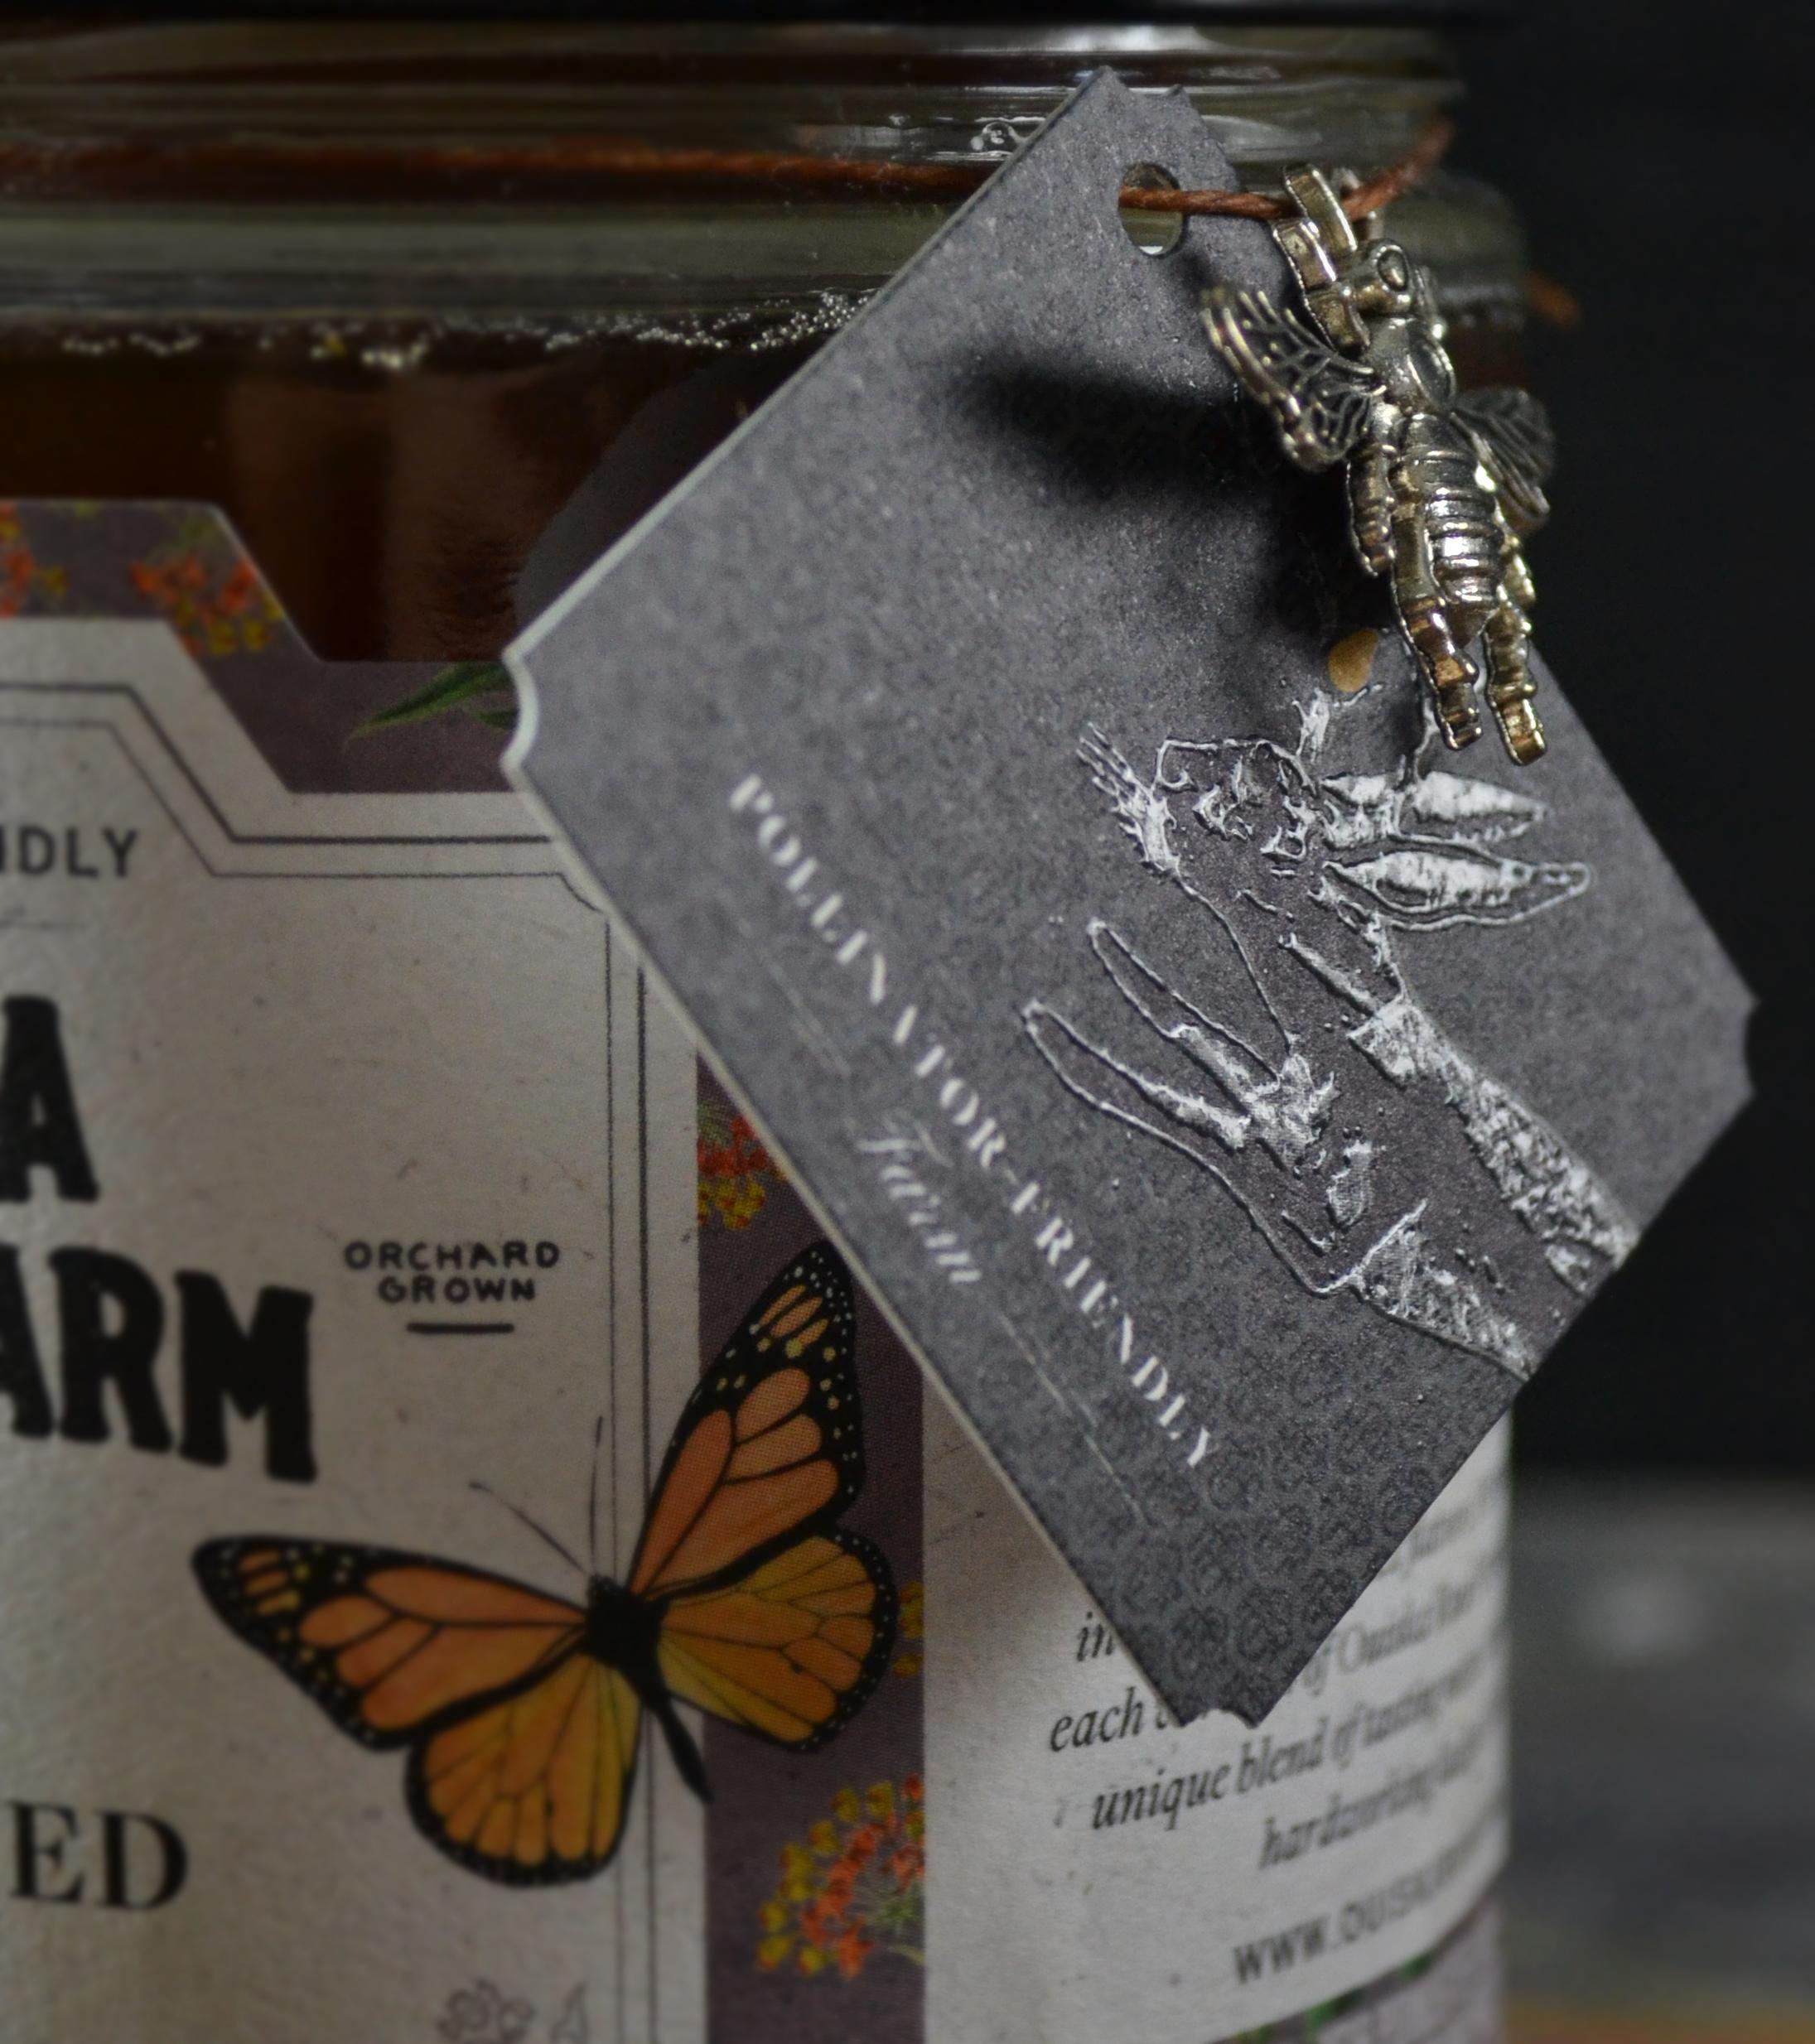 Ouiska Run Farm Honey Package Design Detail